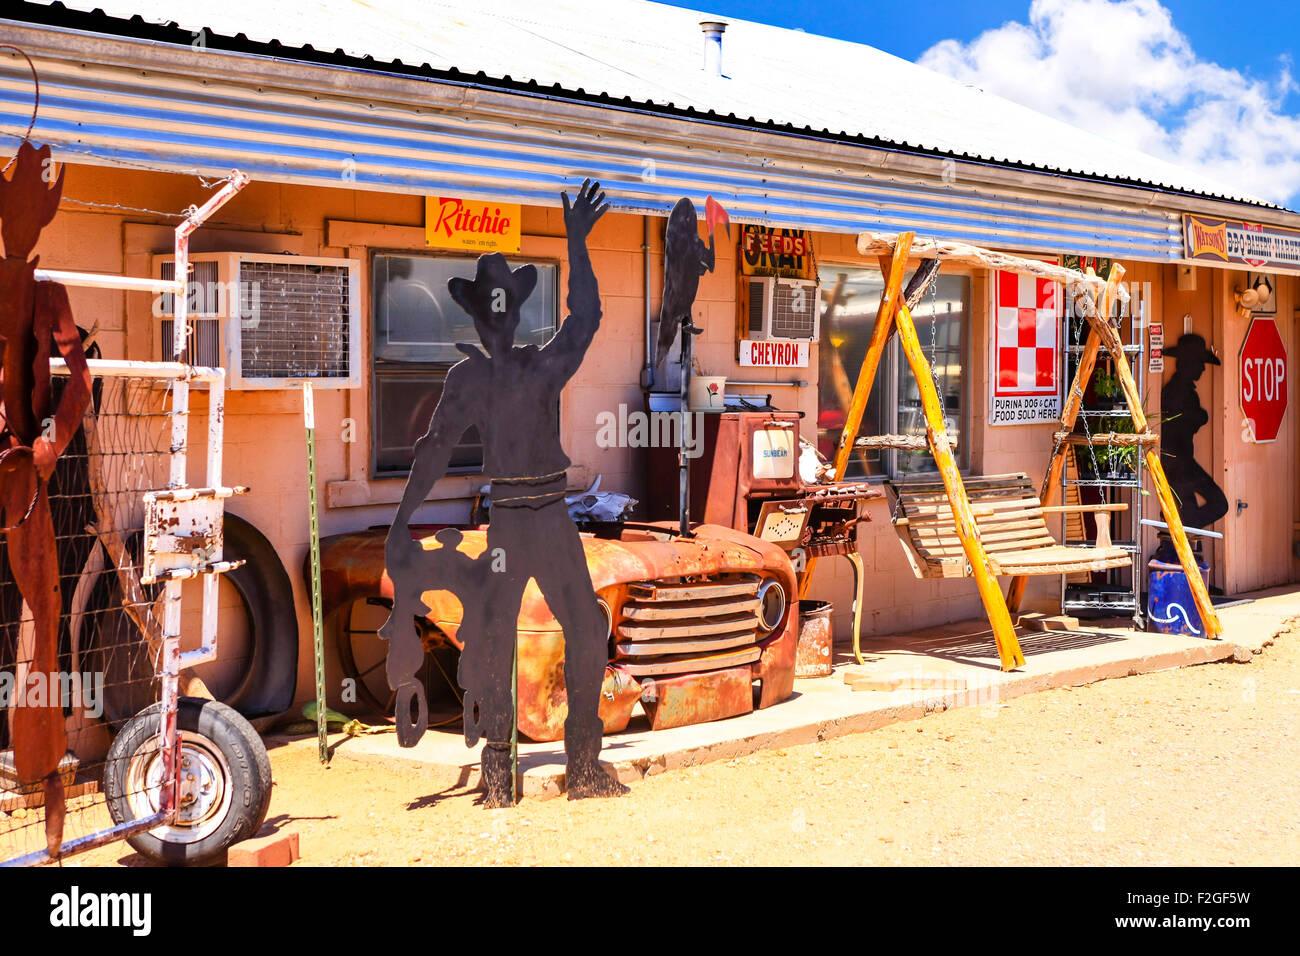 Route 66 Collectibles and Memorabilia in a store yard in Tucumcari NM - Stock Image